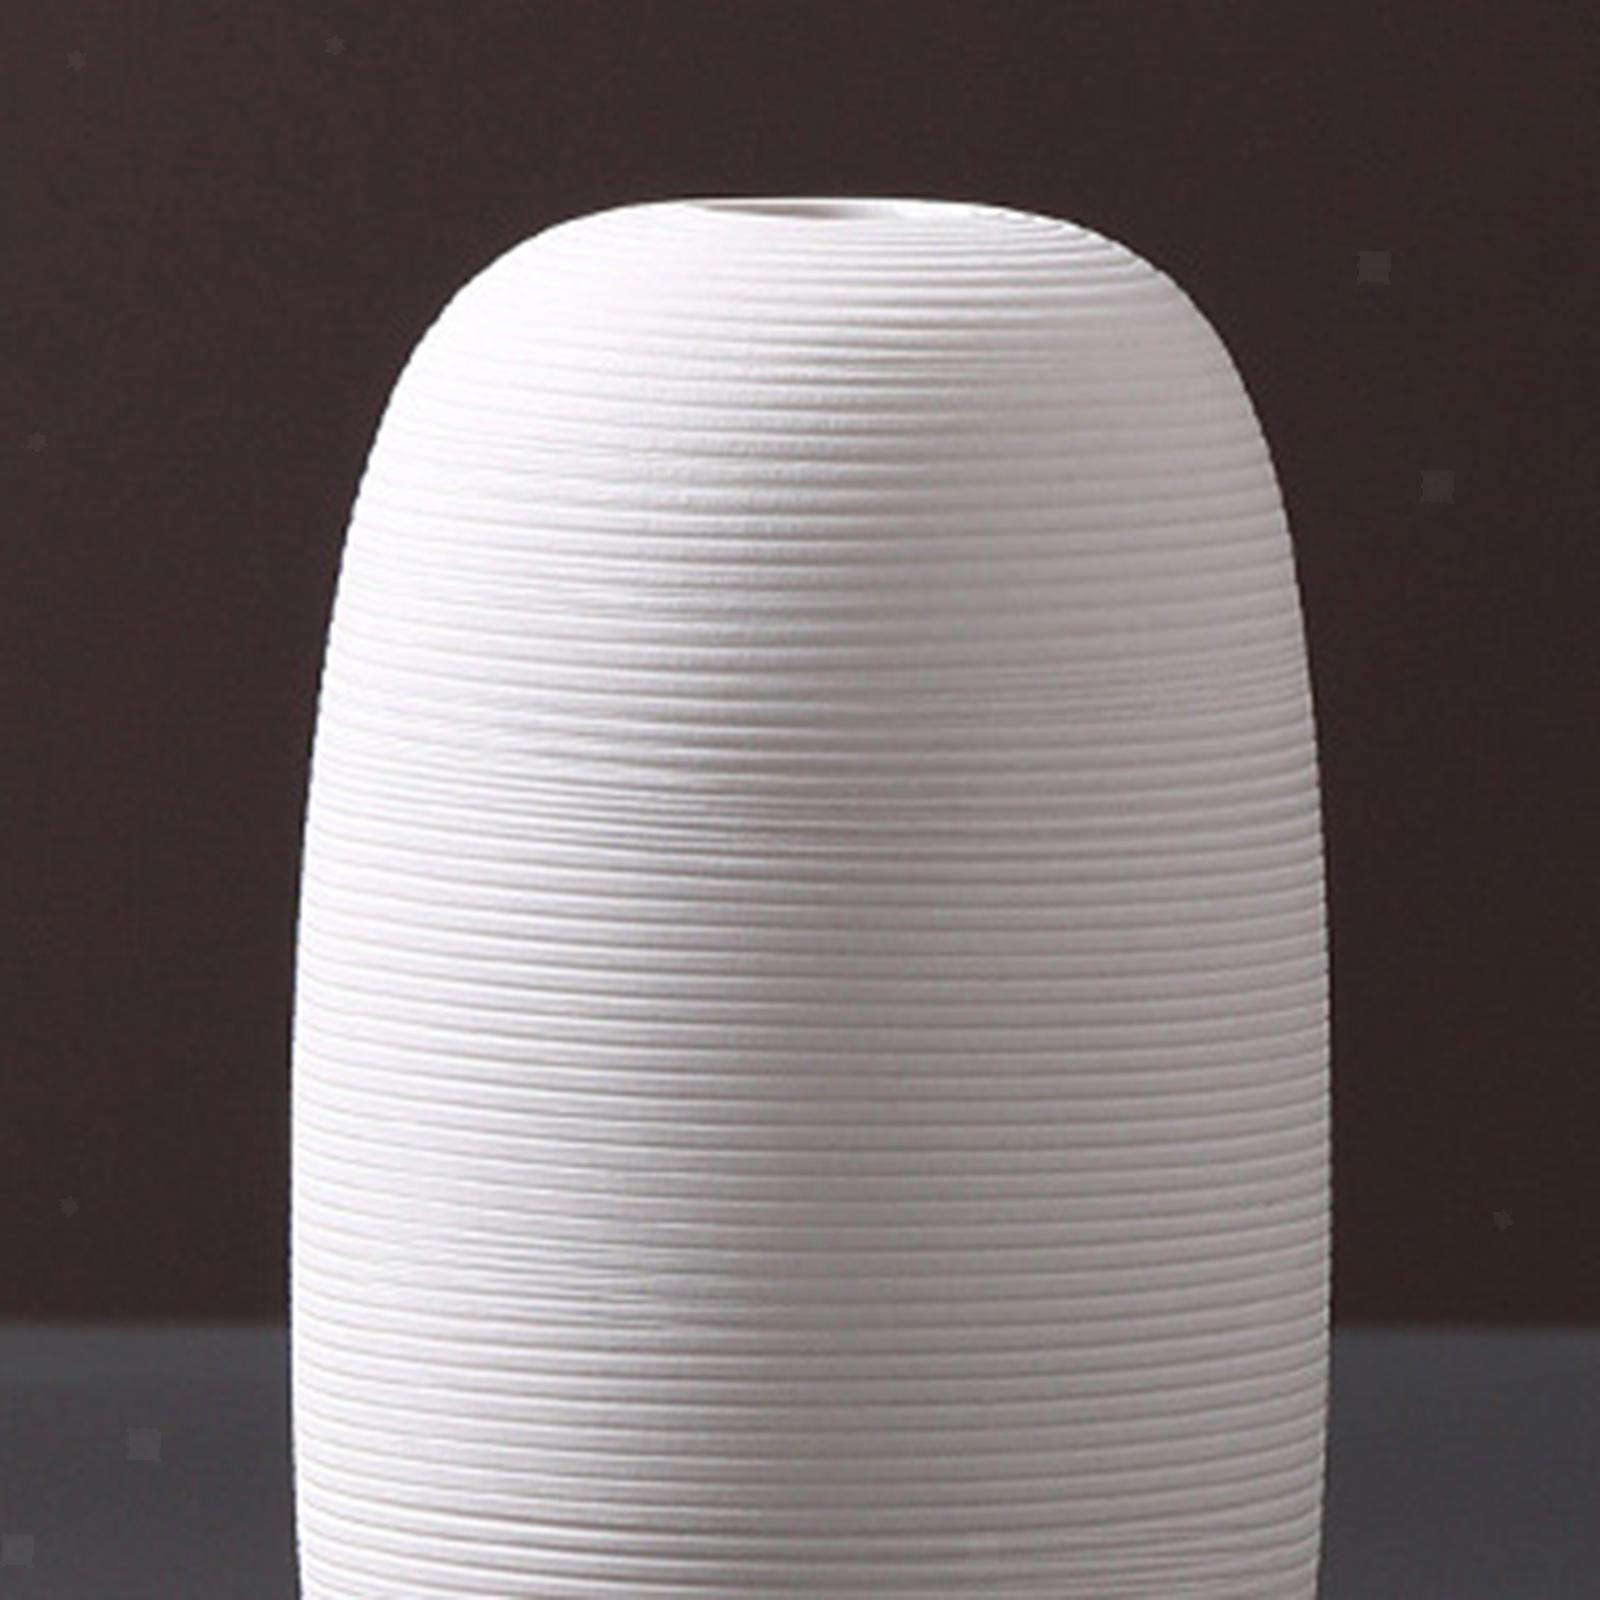 Indexbild 7 - Keramik Blumenvase Blumentöpfe Trockenblumenornamente Blumenvase Dekor